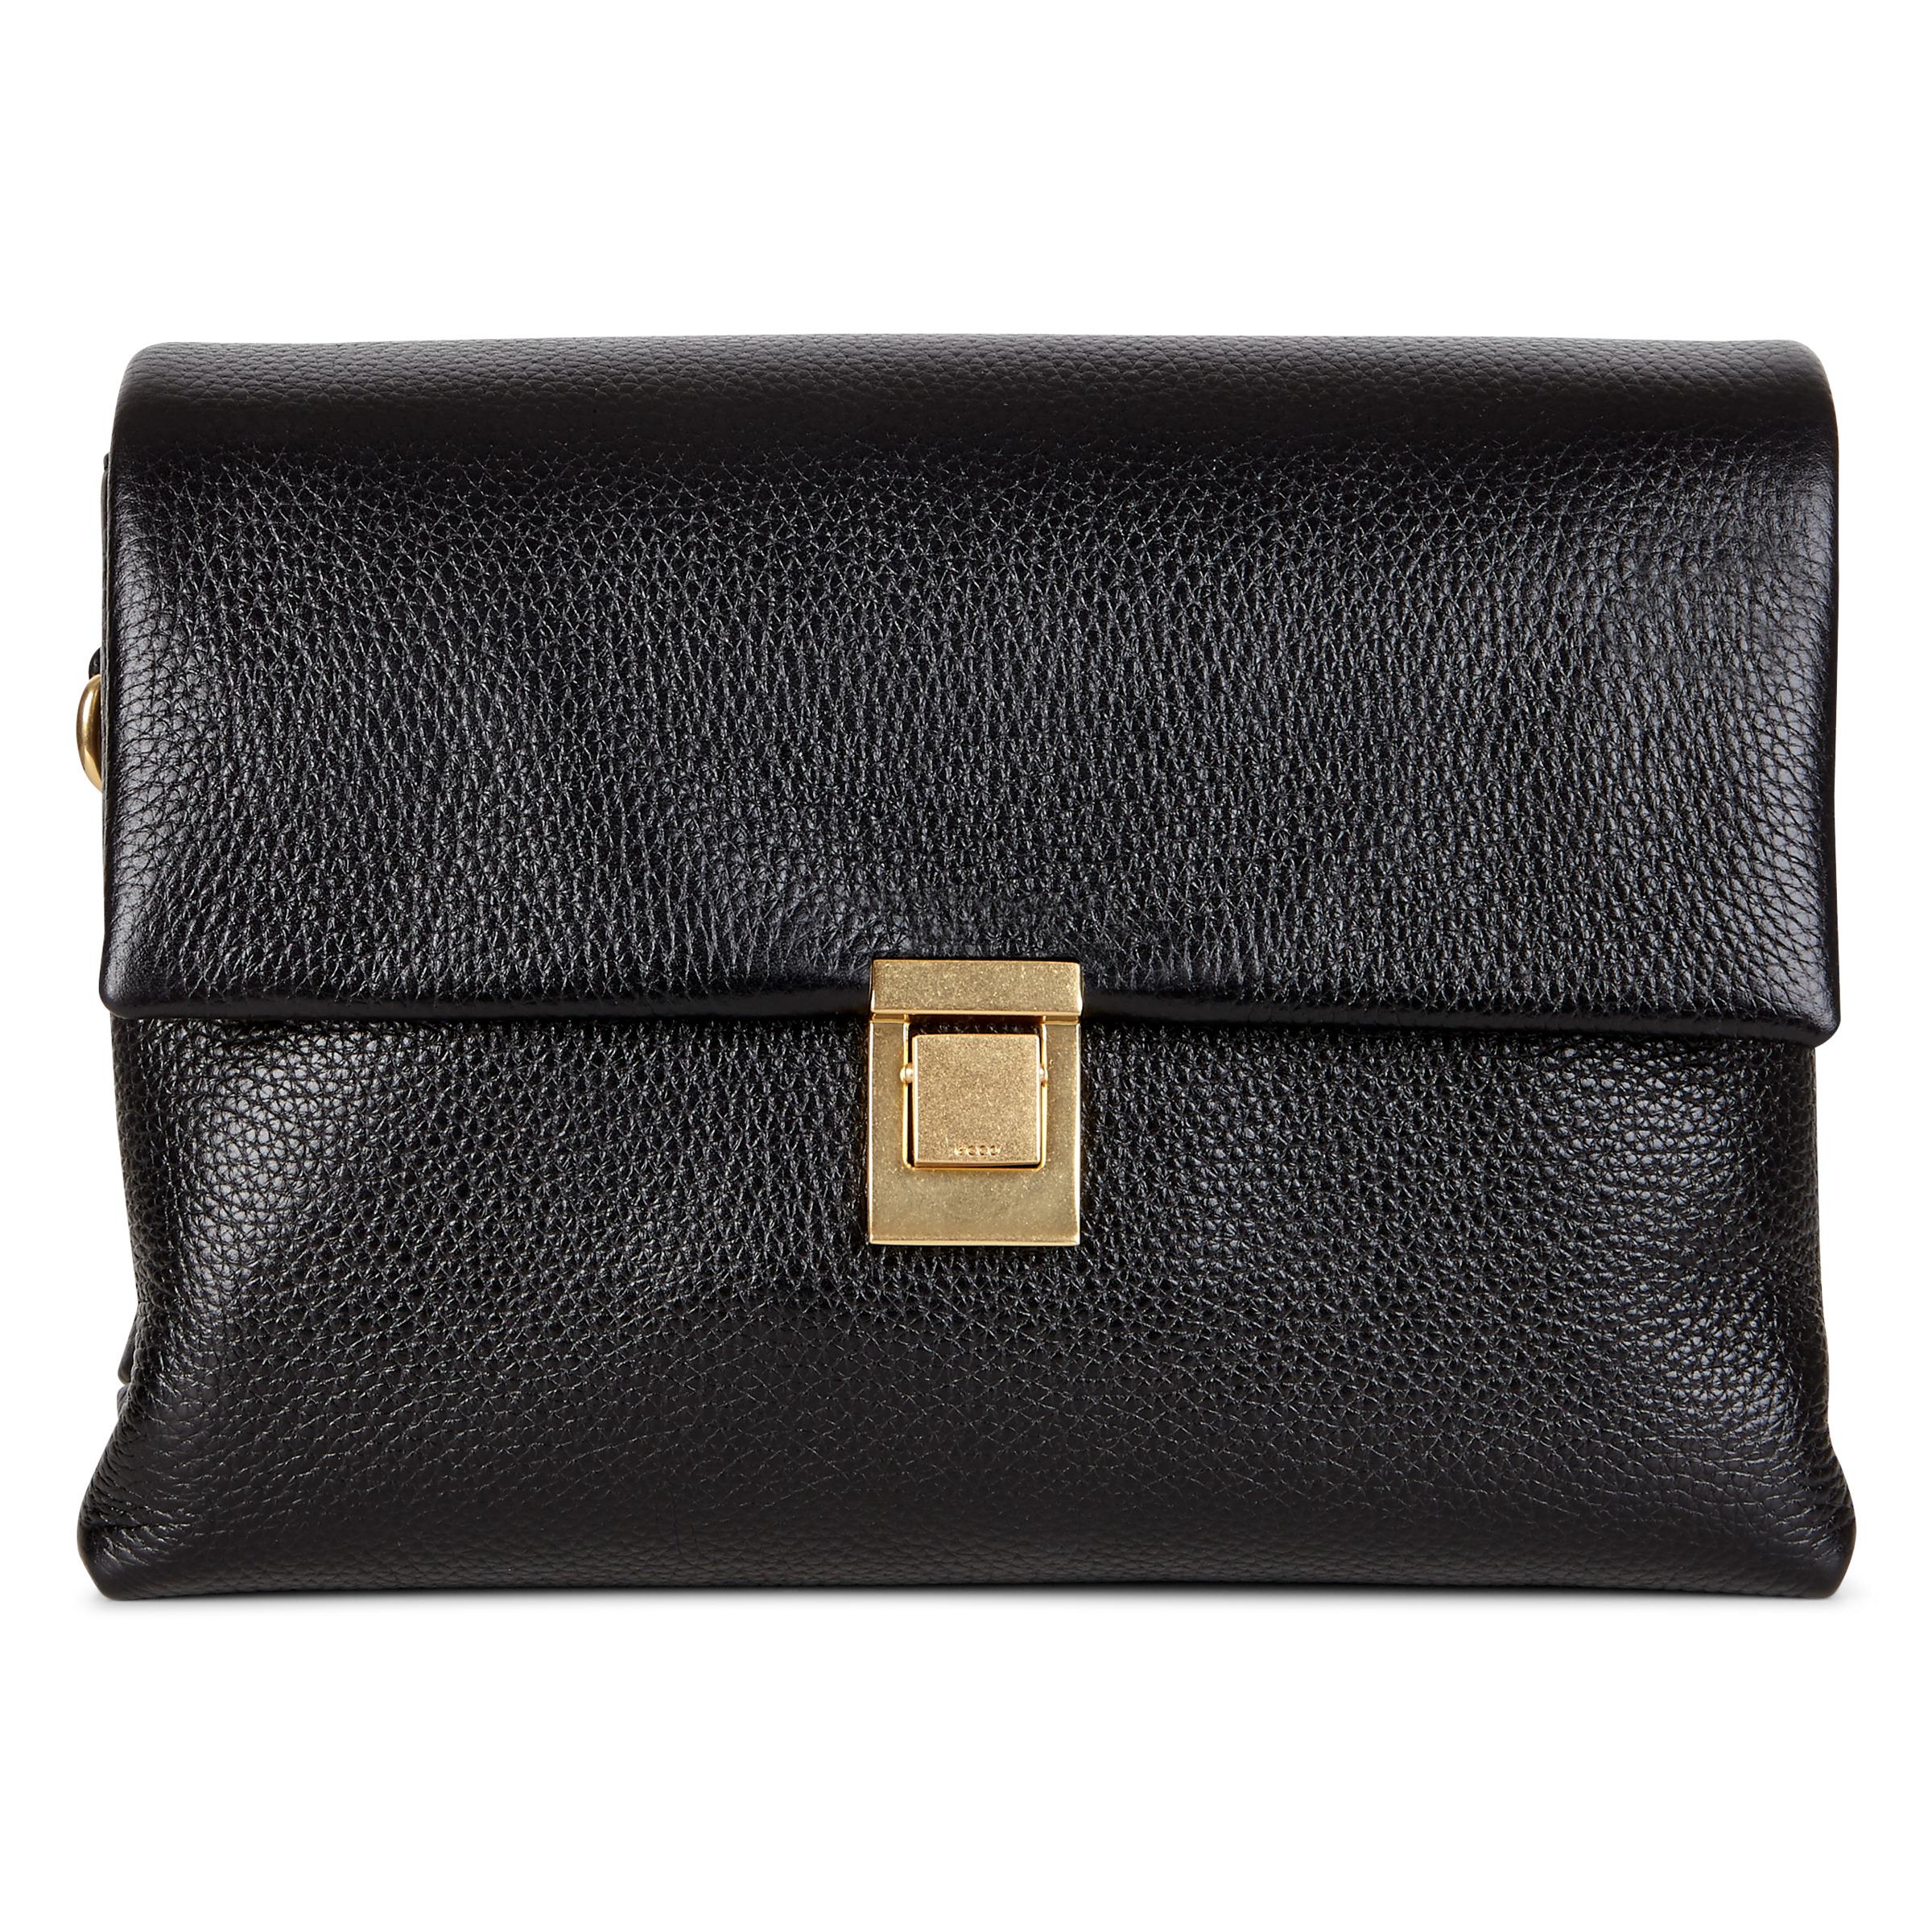 Image of ECCO Isan 2 Handbag